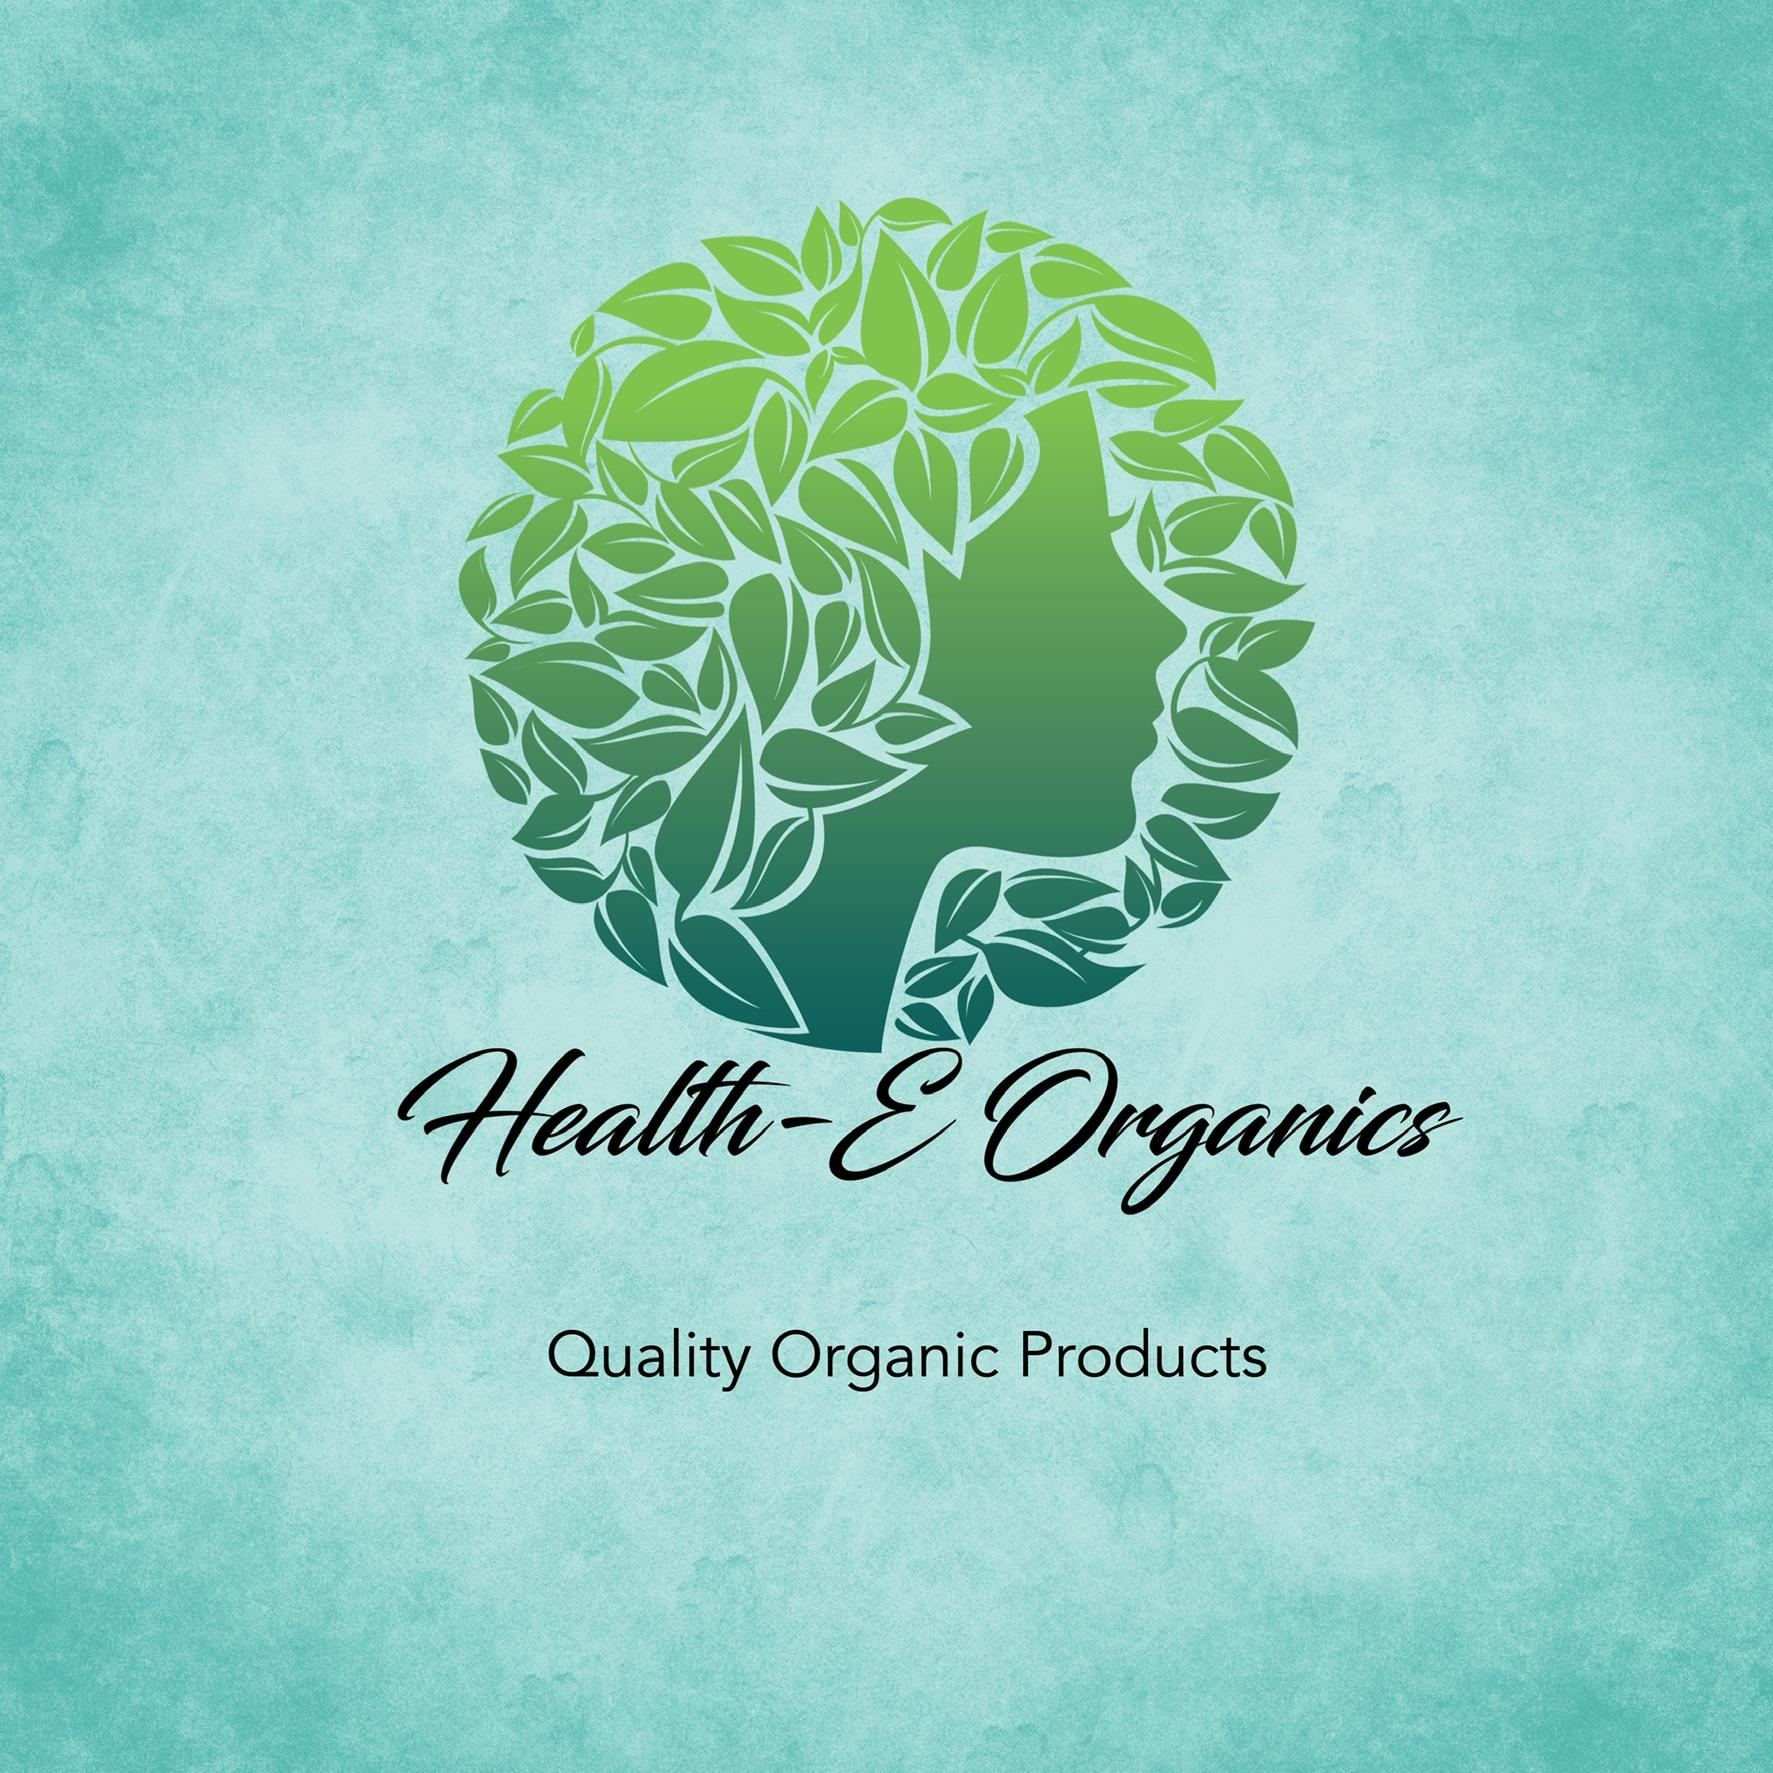 Health-E Organics